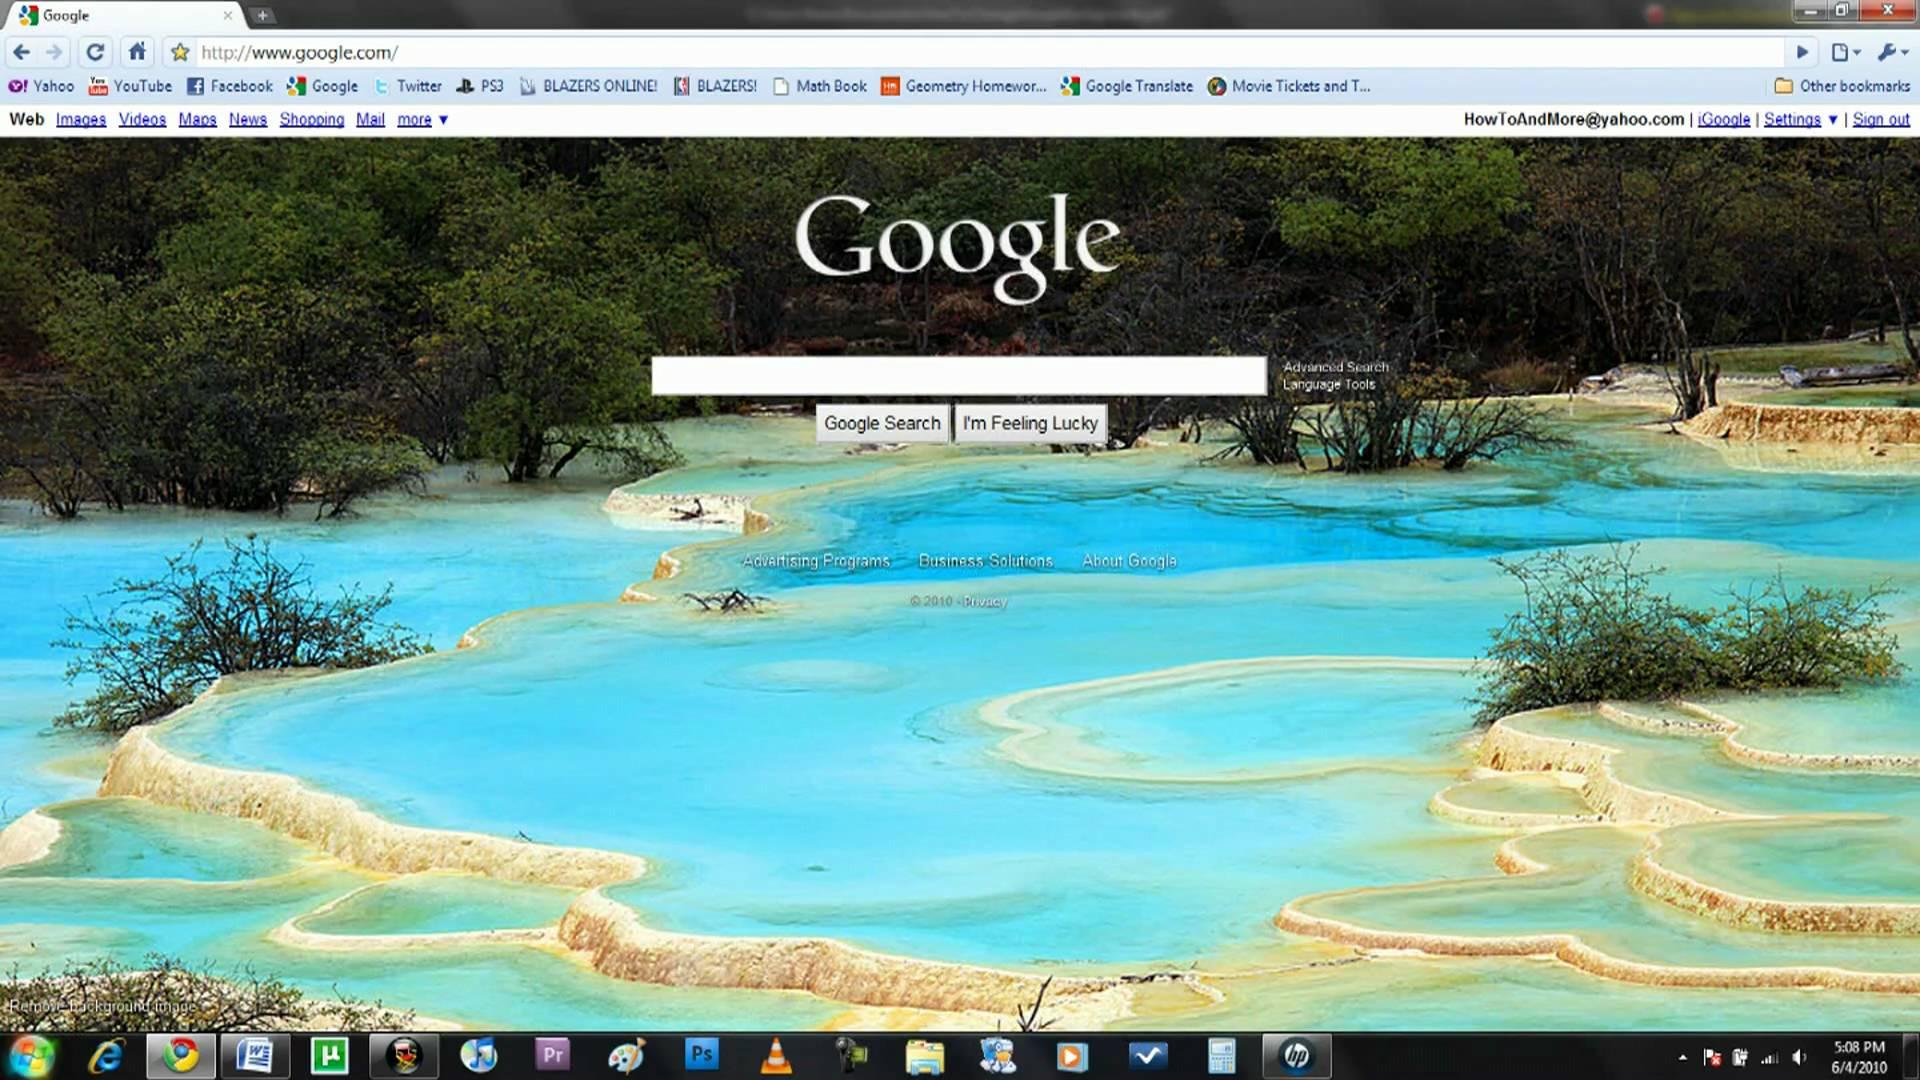 How to Change Google Wallpaper - WallpaperSafari